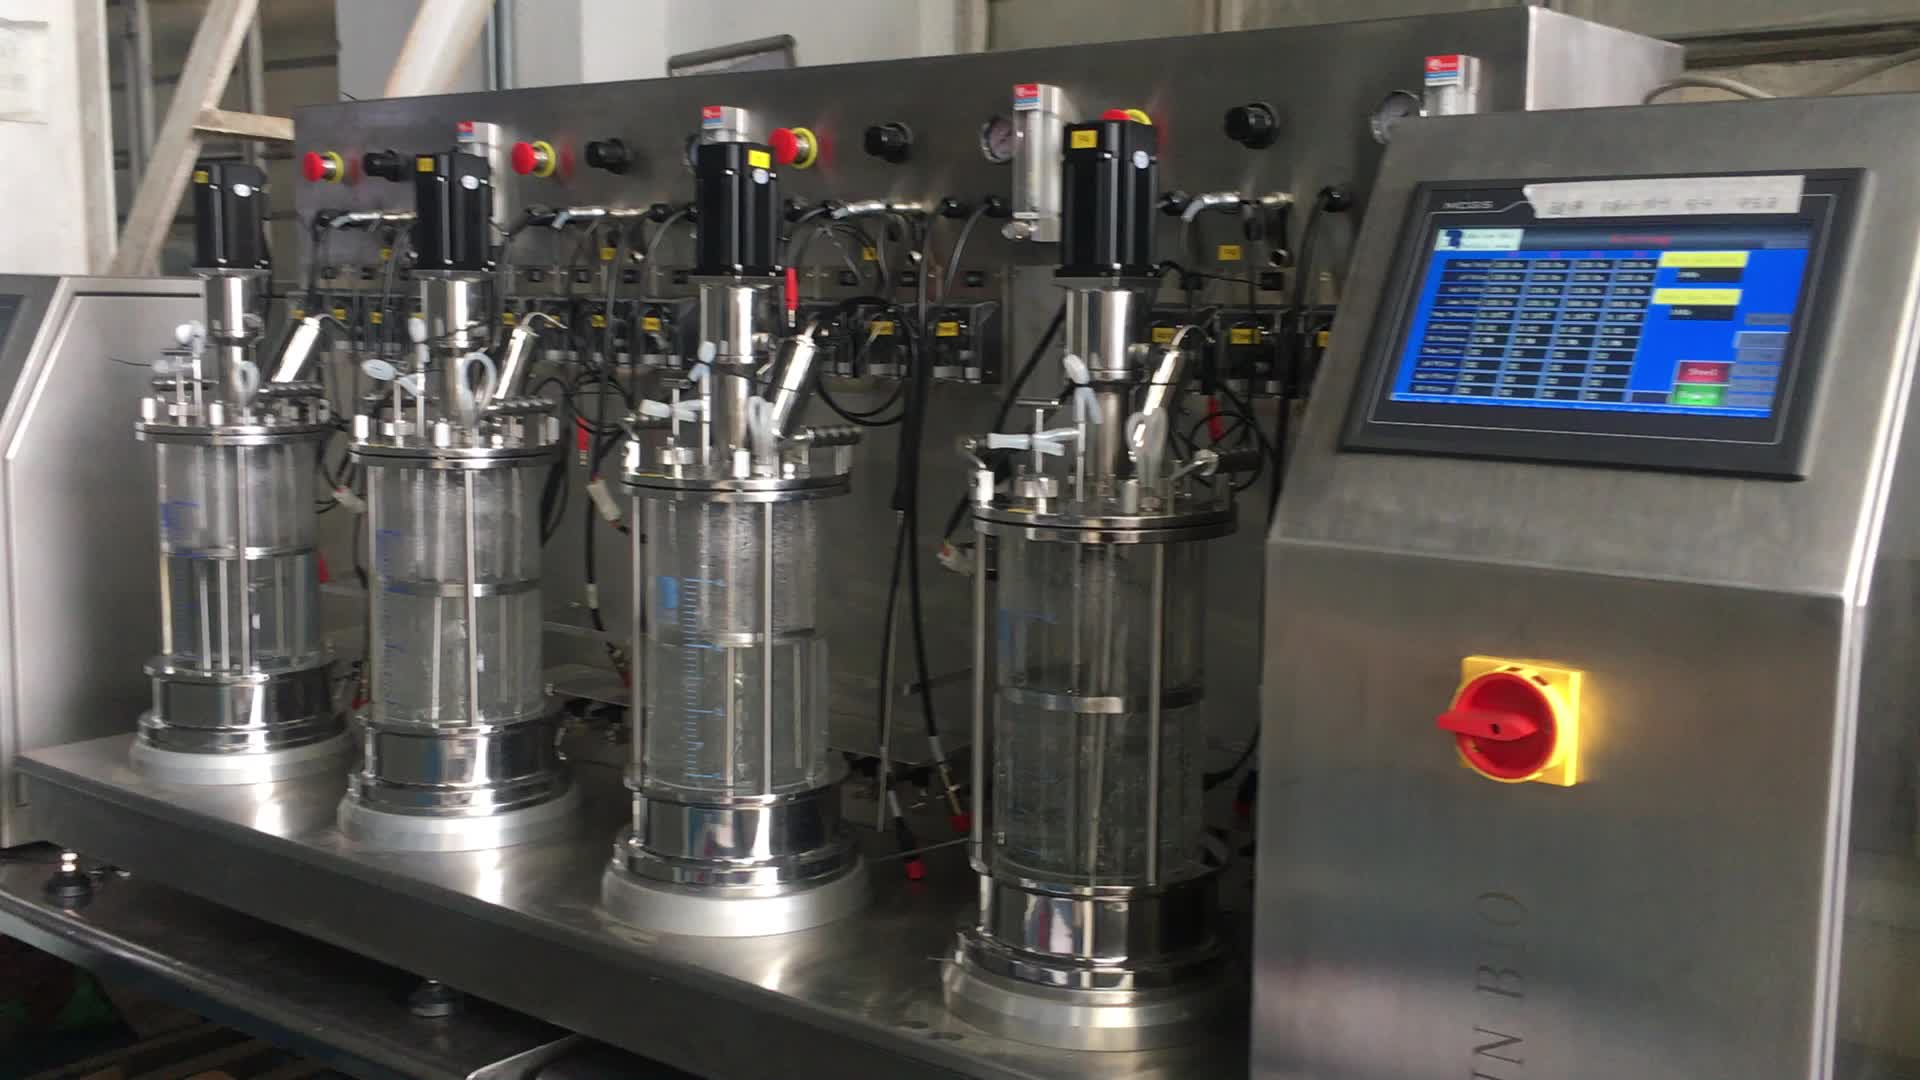 Mini di vetro bioreattore a, carbonatazione burp fermentatore conico, facile da fermentatore faq